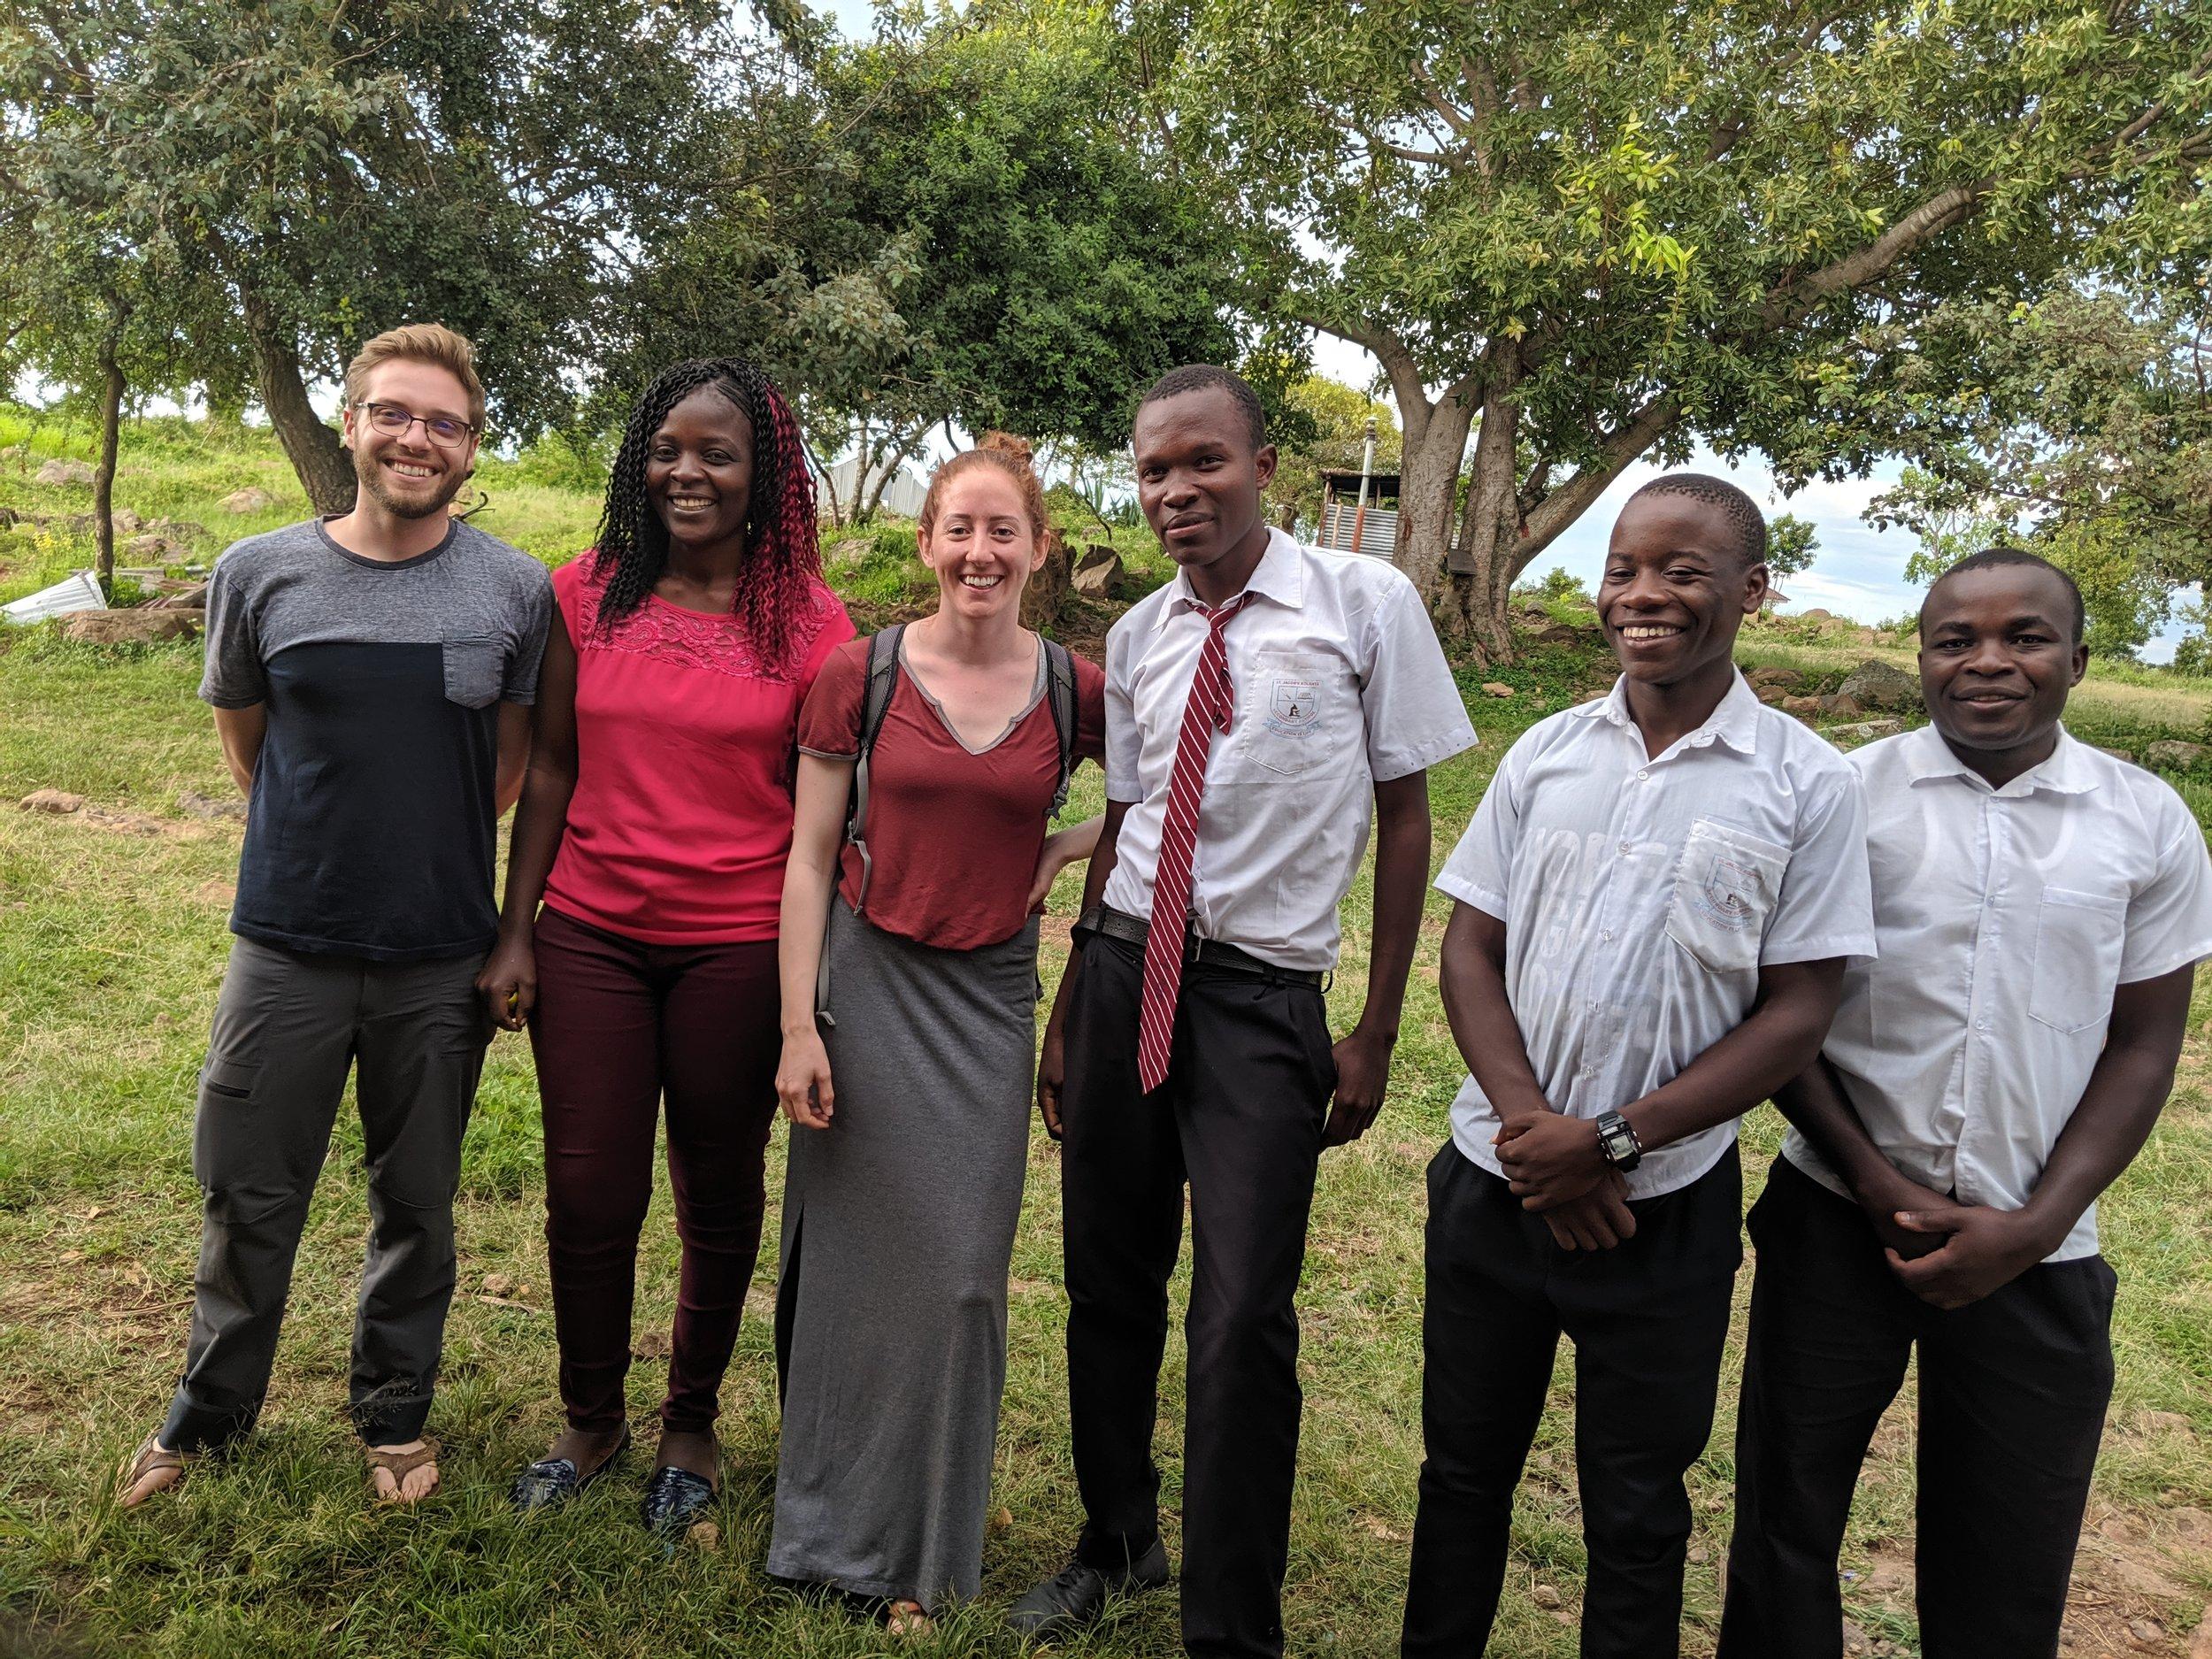 2019-05 L to R JWittel MaryAnne Omendah KWittel James Omolo Alvin Mkanji Jacob Kayaga at St Jacob Kolanya Mixed Secondary School.jpg